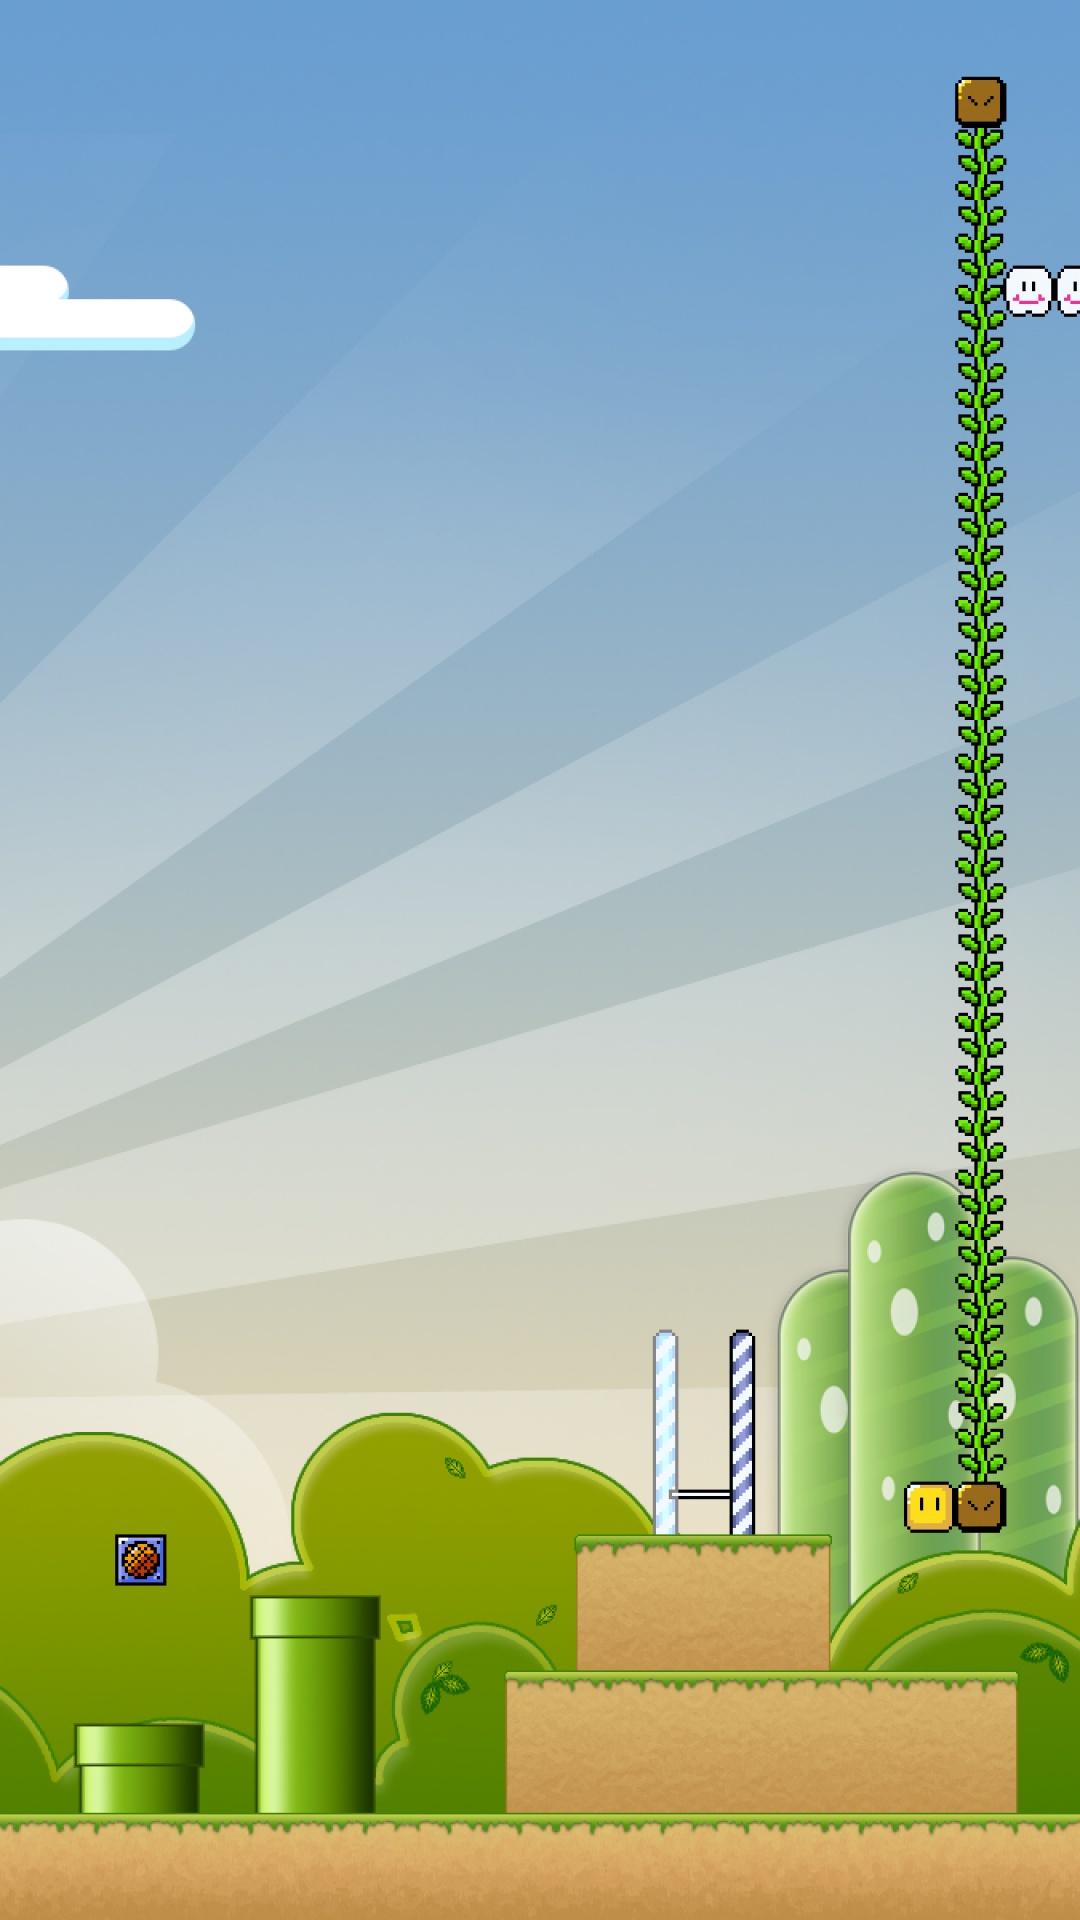 Mario iphone wallpaper mushrooms red green 1 up